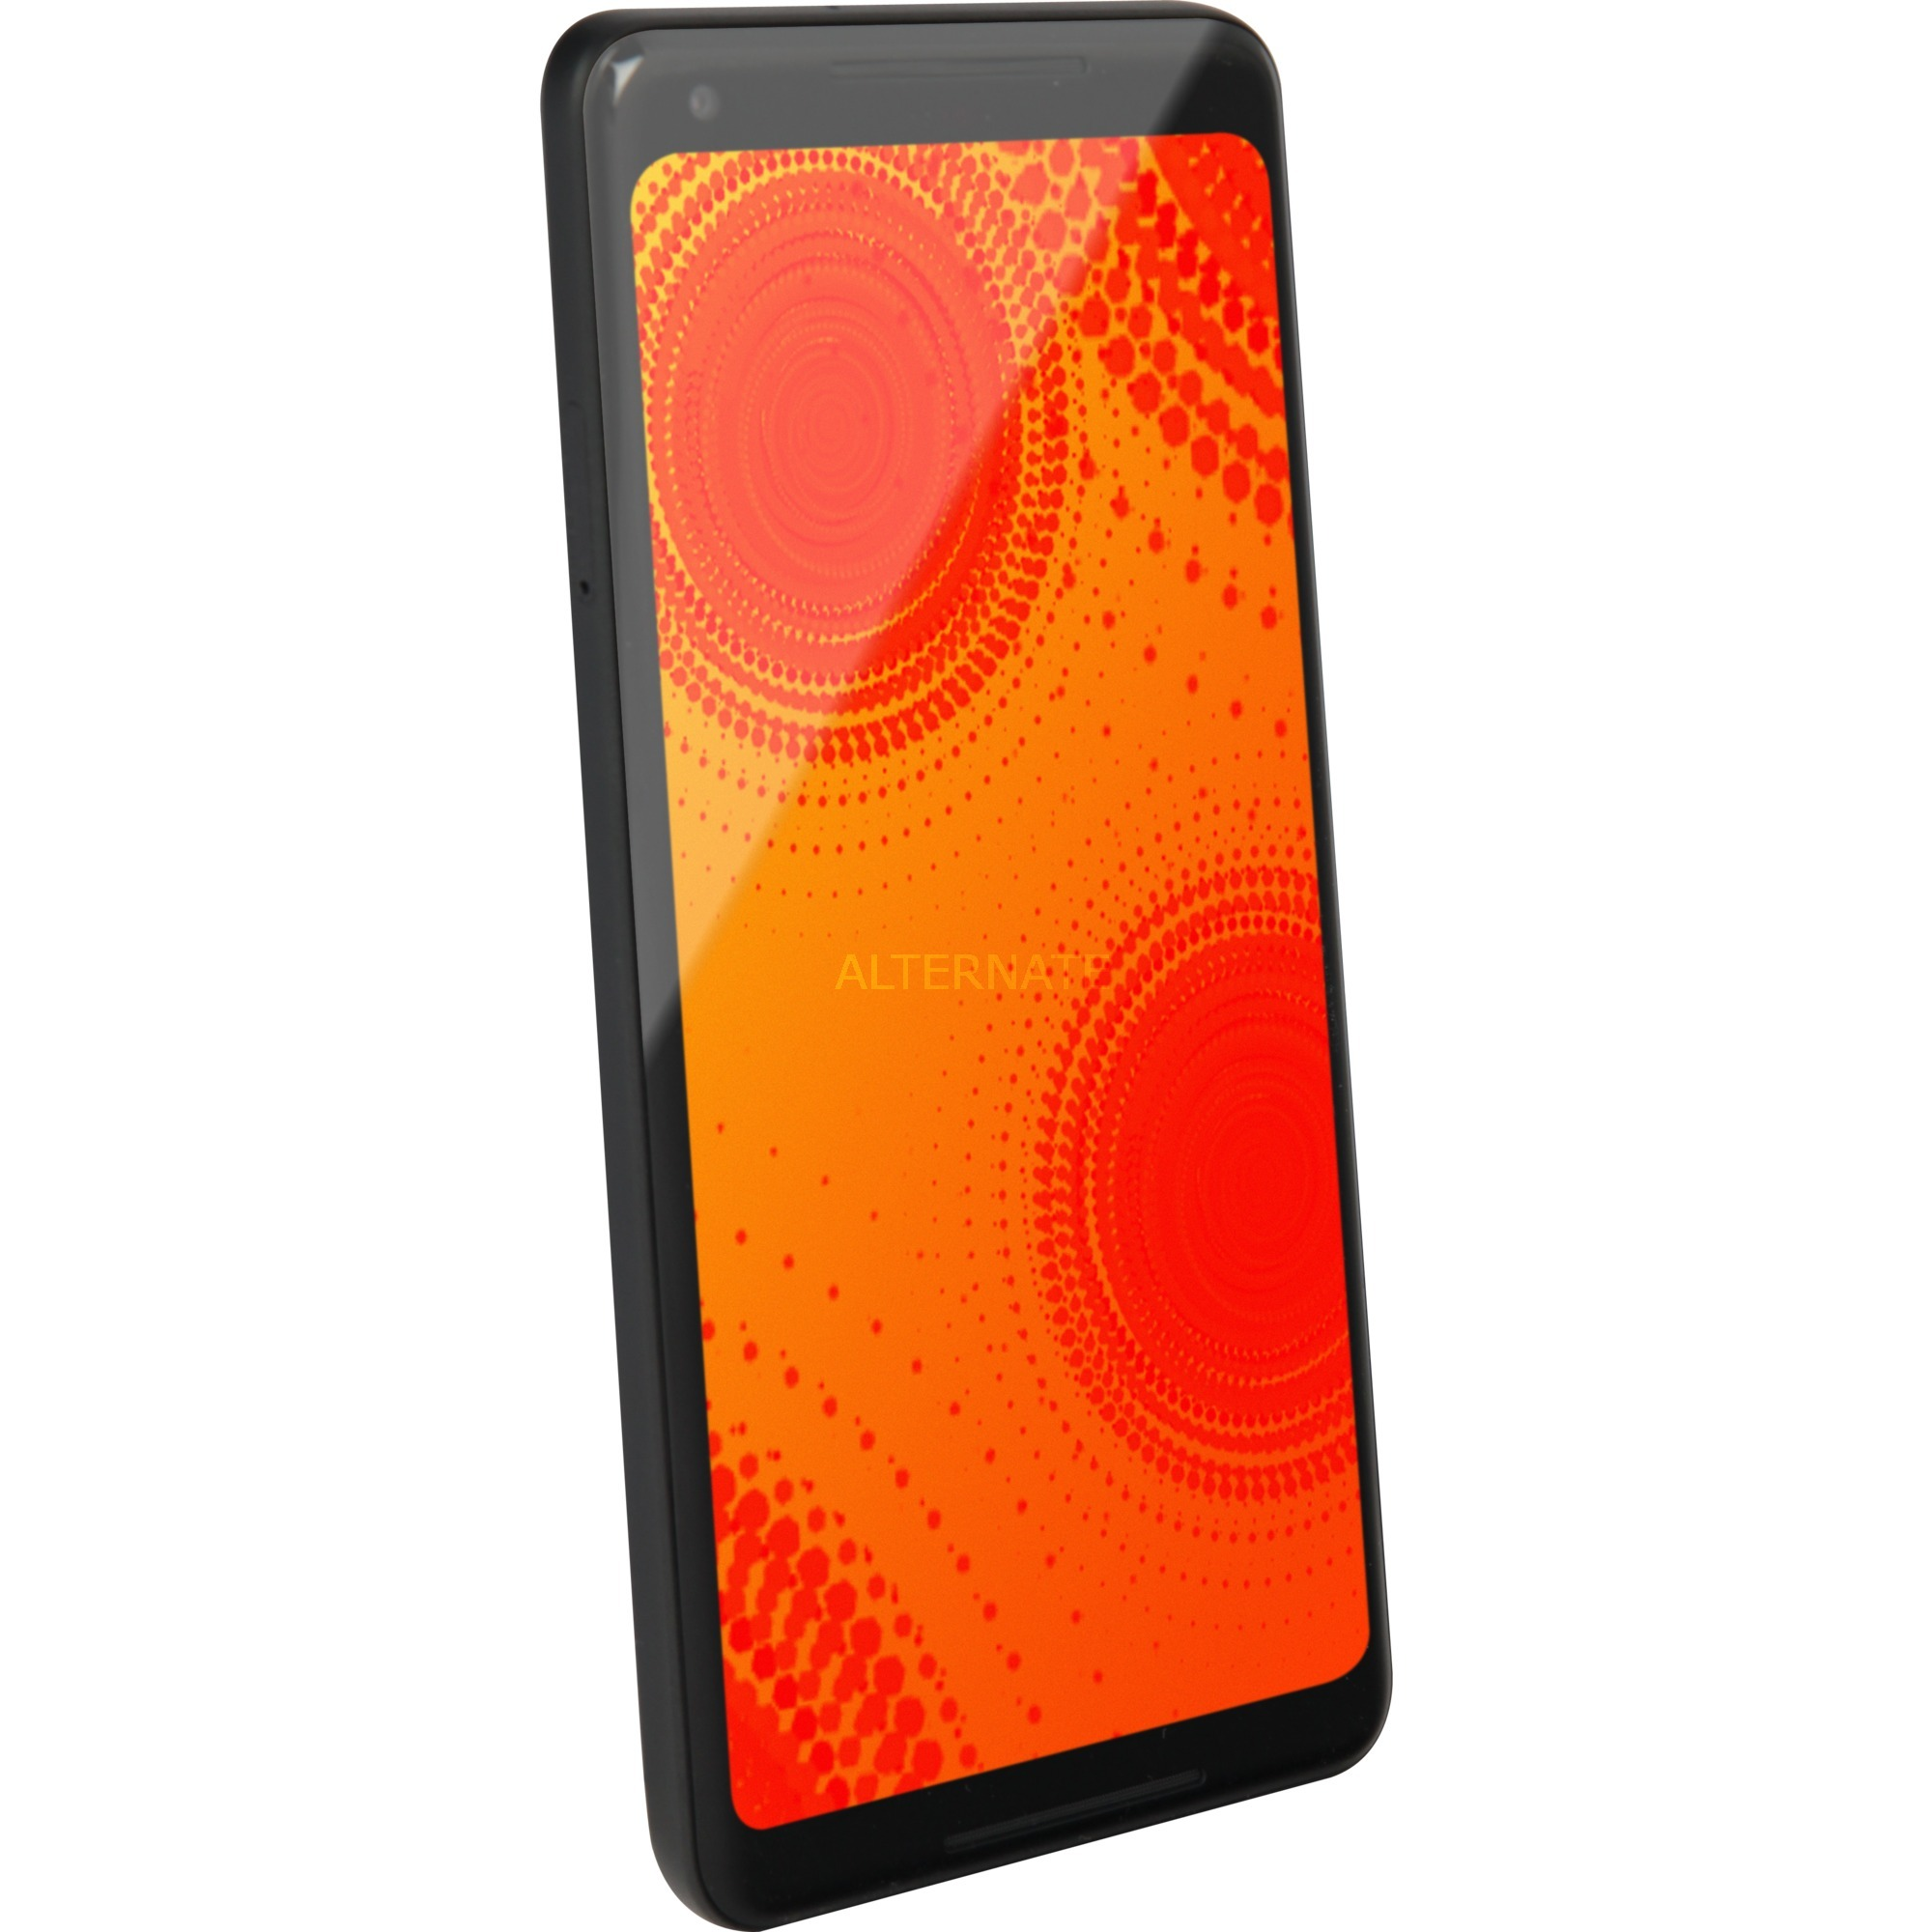 "Pixel 2 XL 15,2 cm (6"") 4 GB 128 GB SIM única 4G Negro 3520 mAh, Móvil"